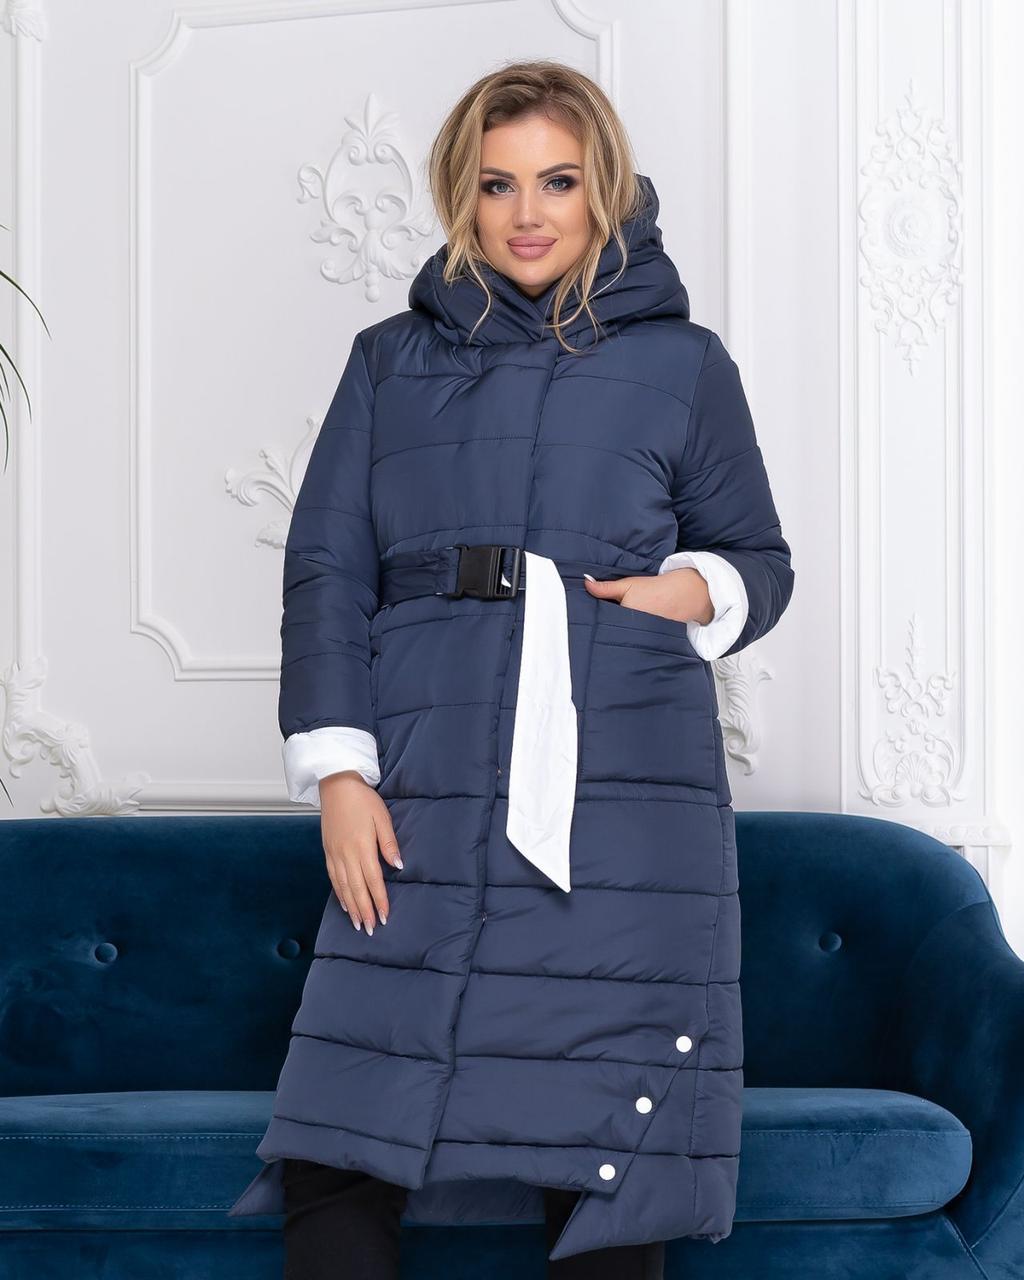 Теплое зимнее пальто,темно-синее с белым, батал, ткань плащевка, арт.М 032